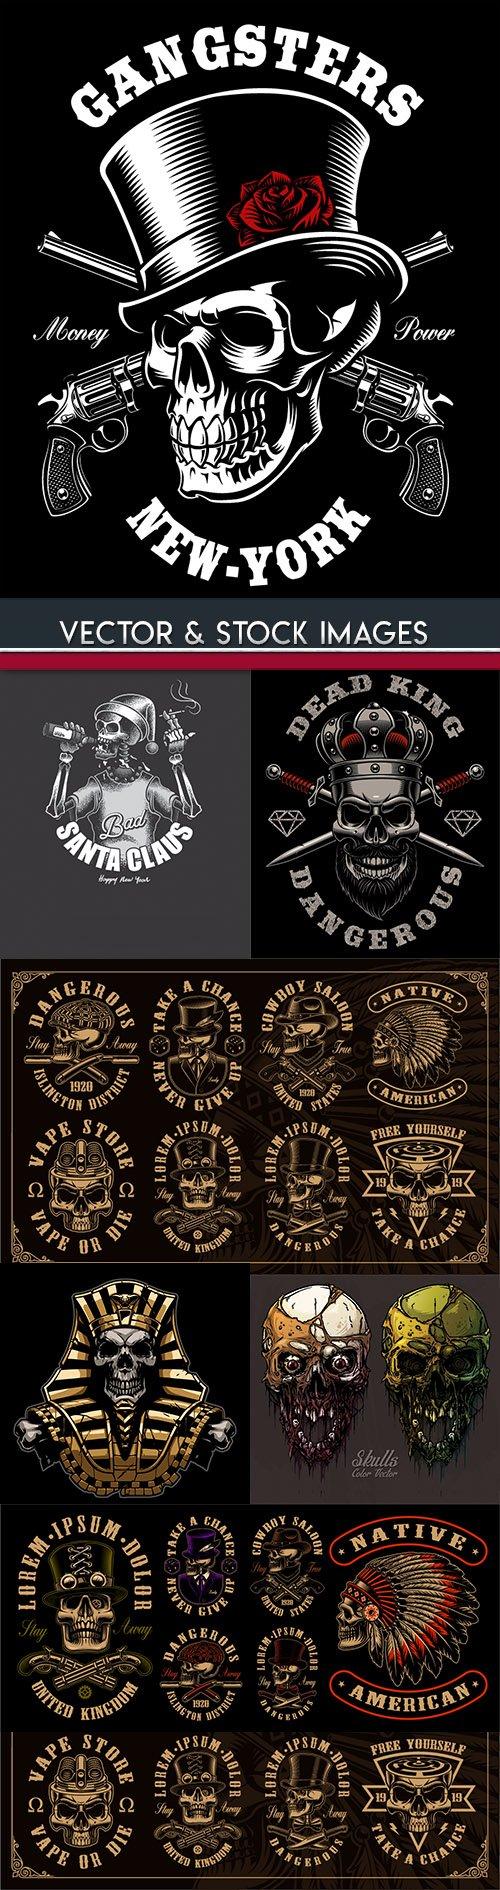 Skull and accessories grunge label drawn design 7